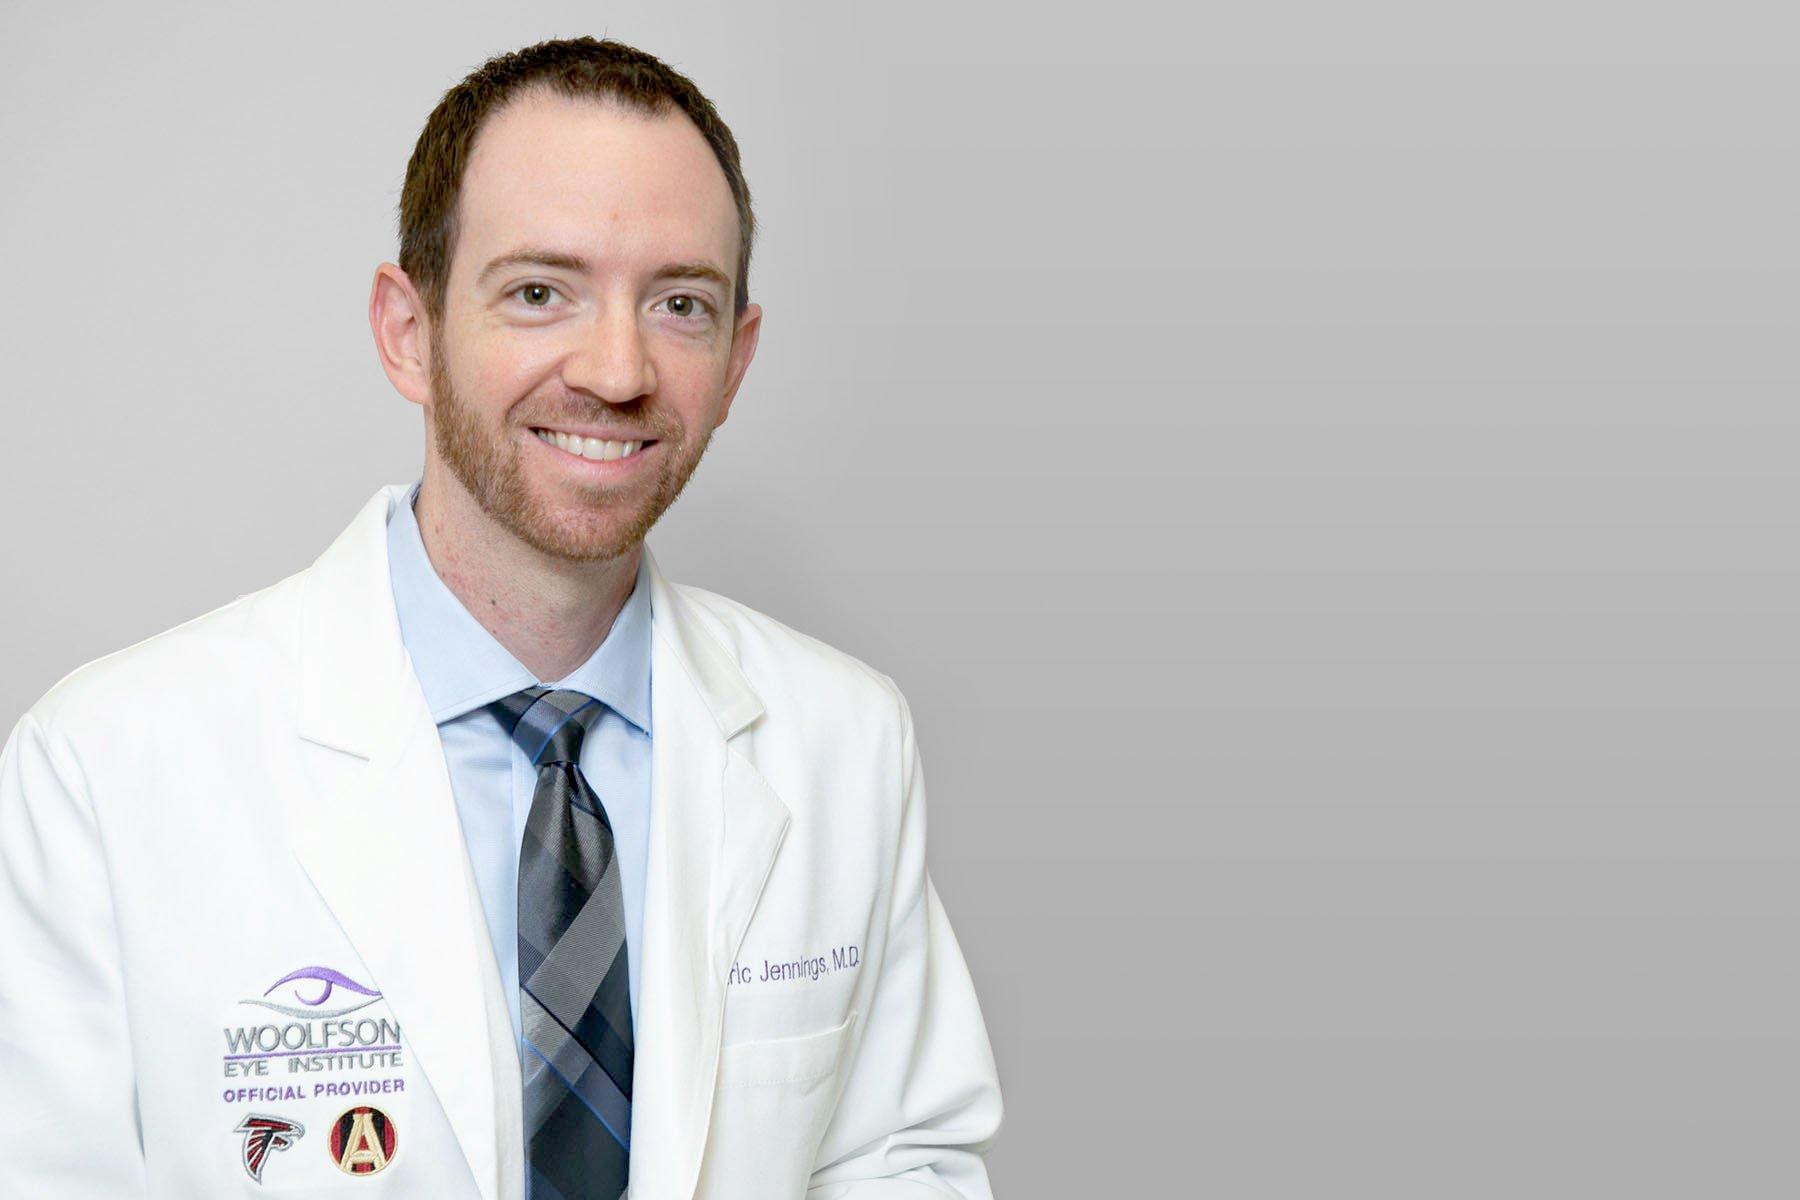 Eric Jennings, MD